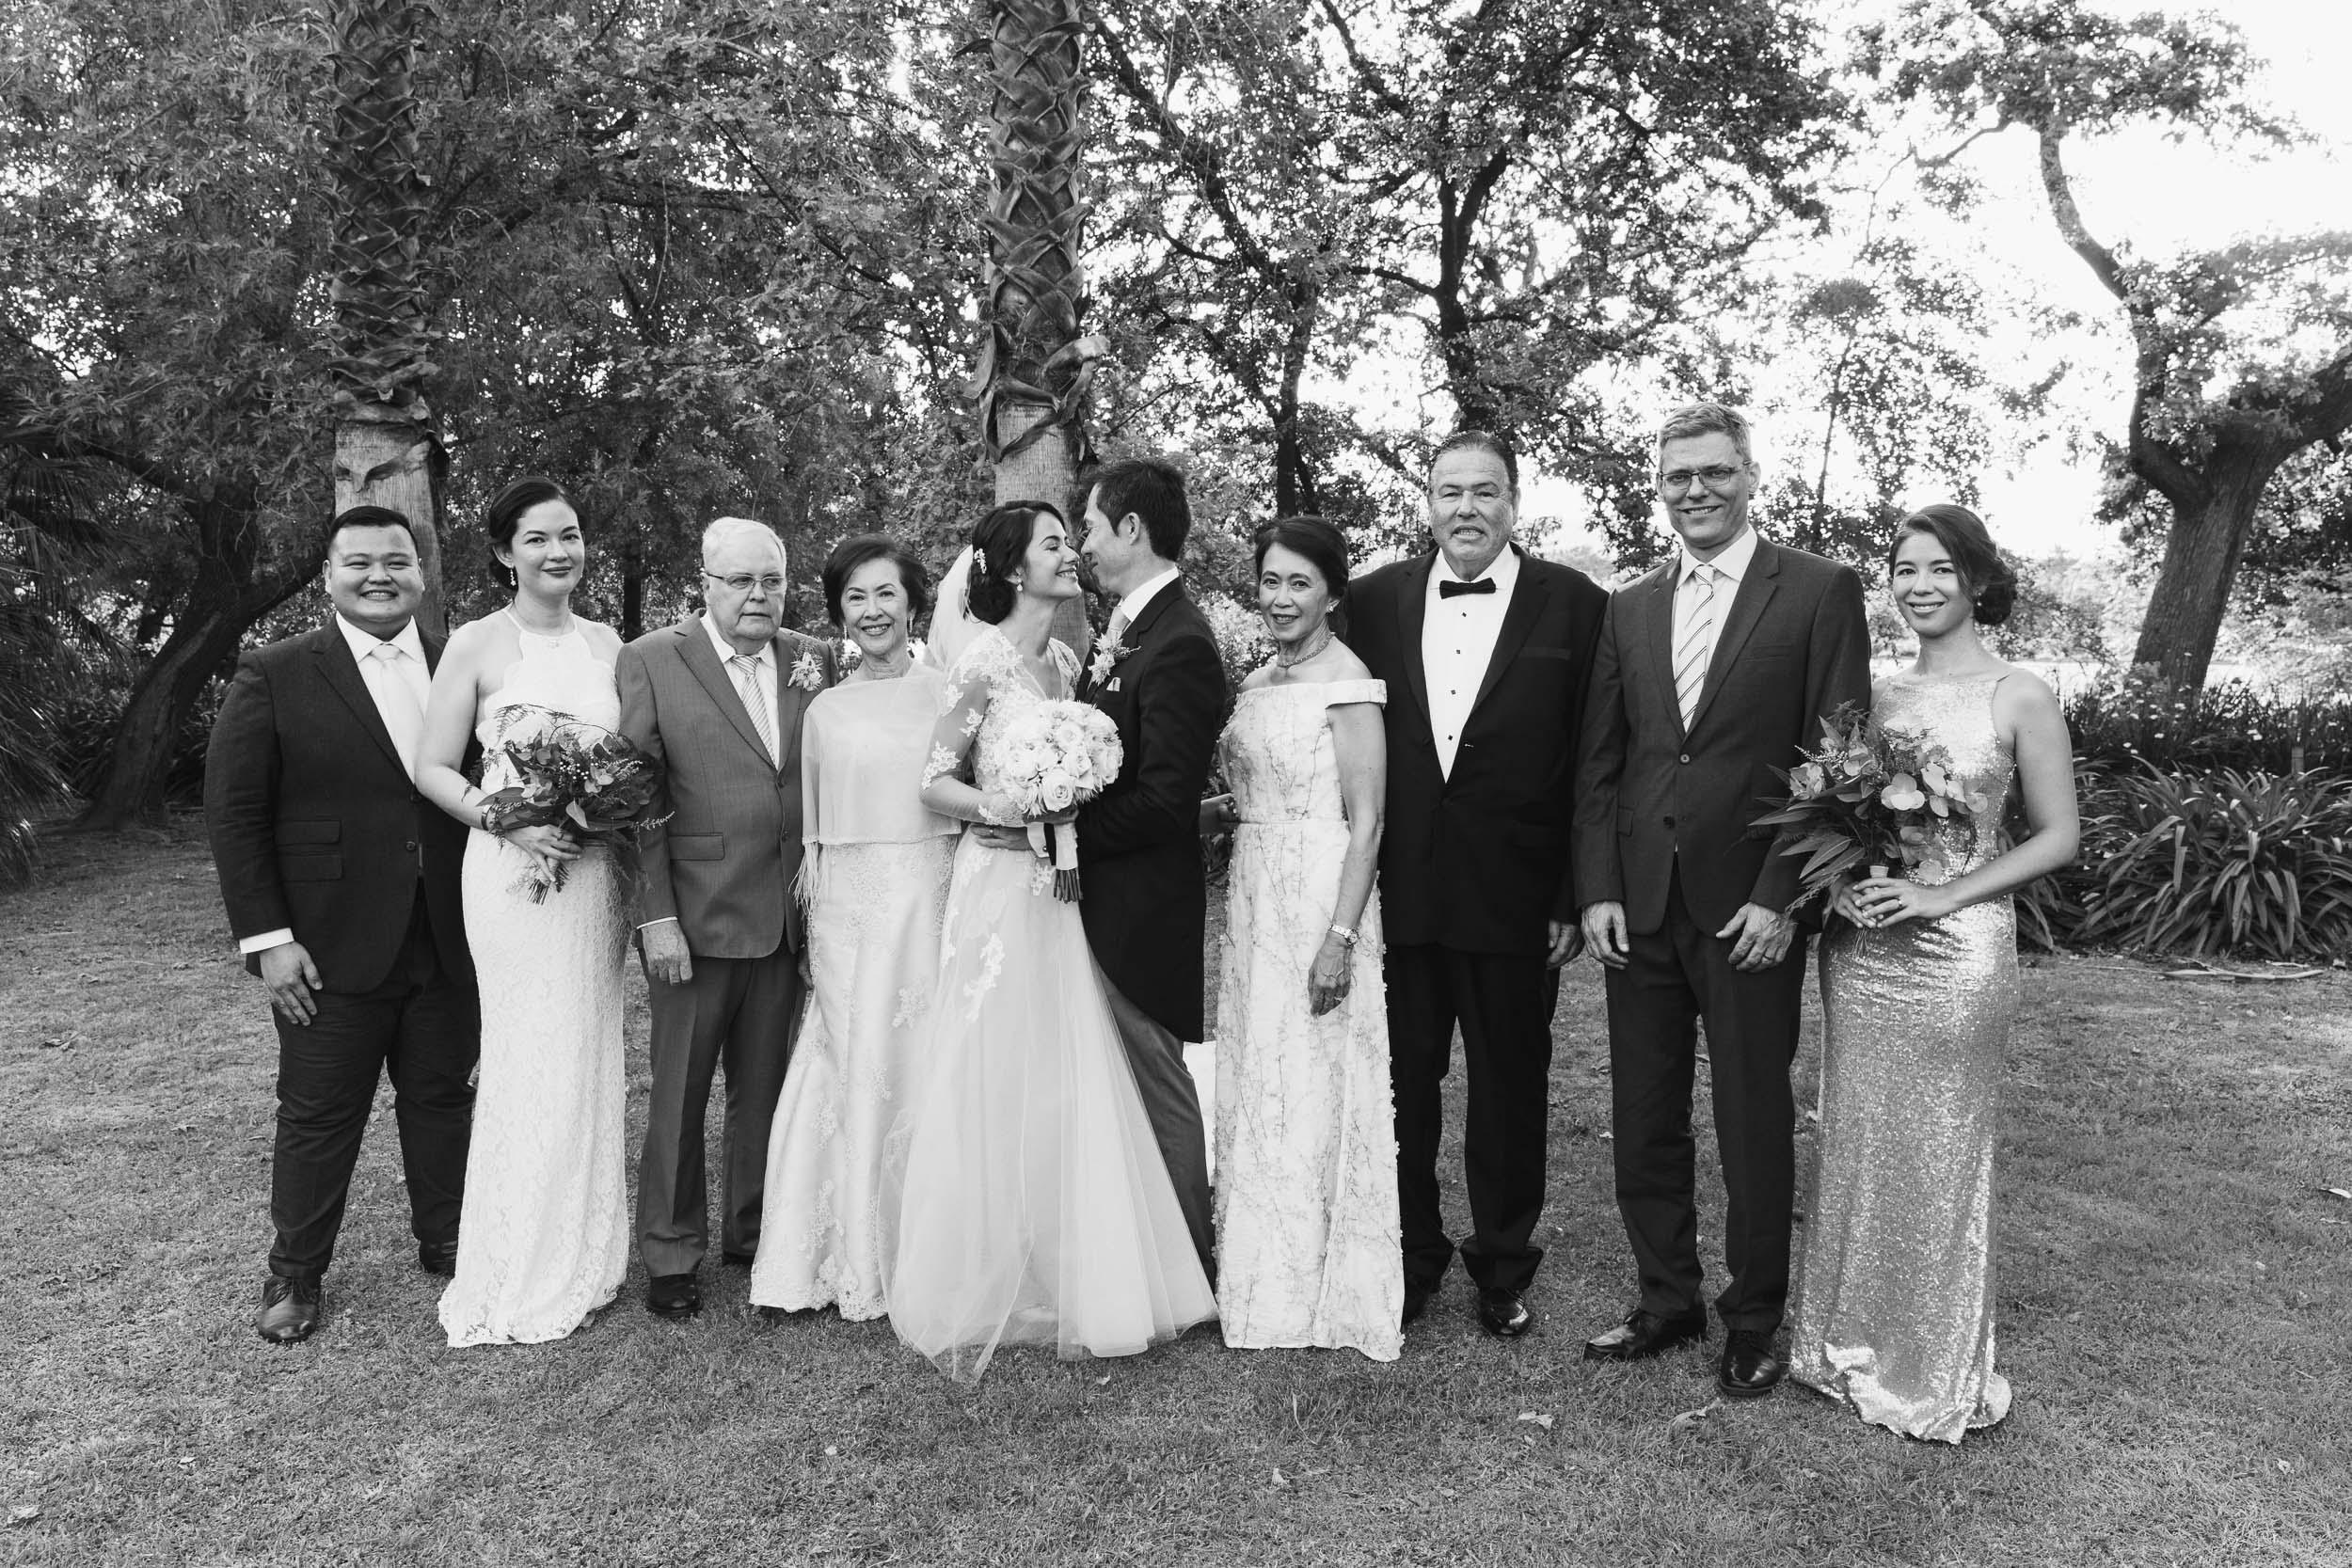 Jenny-Rockett-John-Scranton-Cape-Town-Wedding-Photographer-Andrea-Kellan-135.jpg